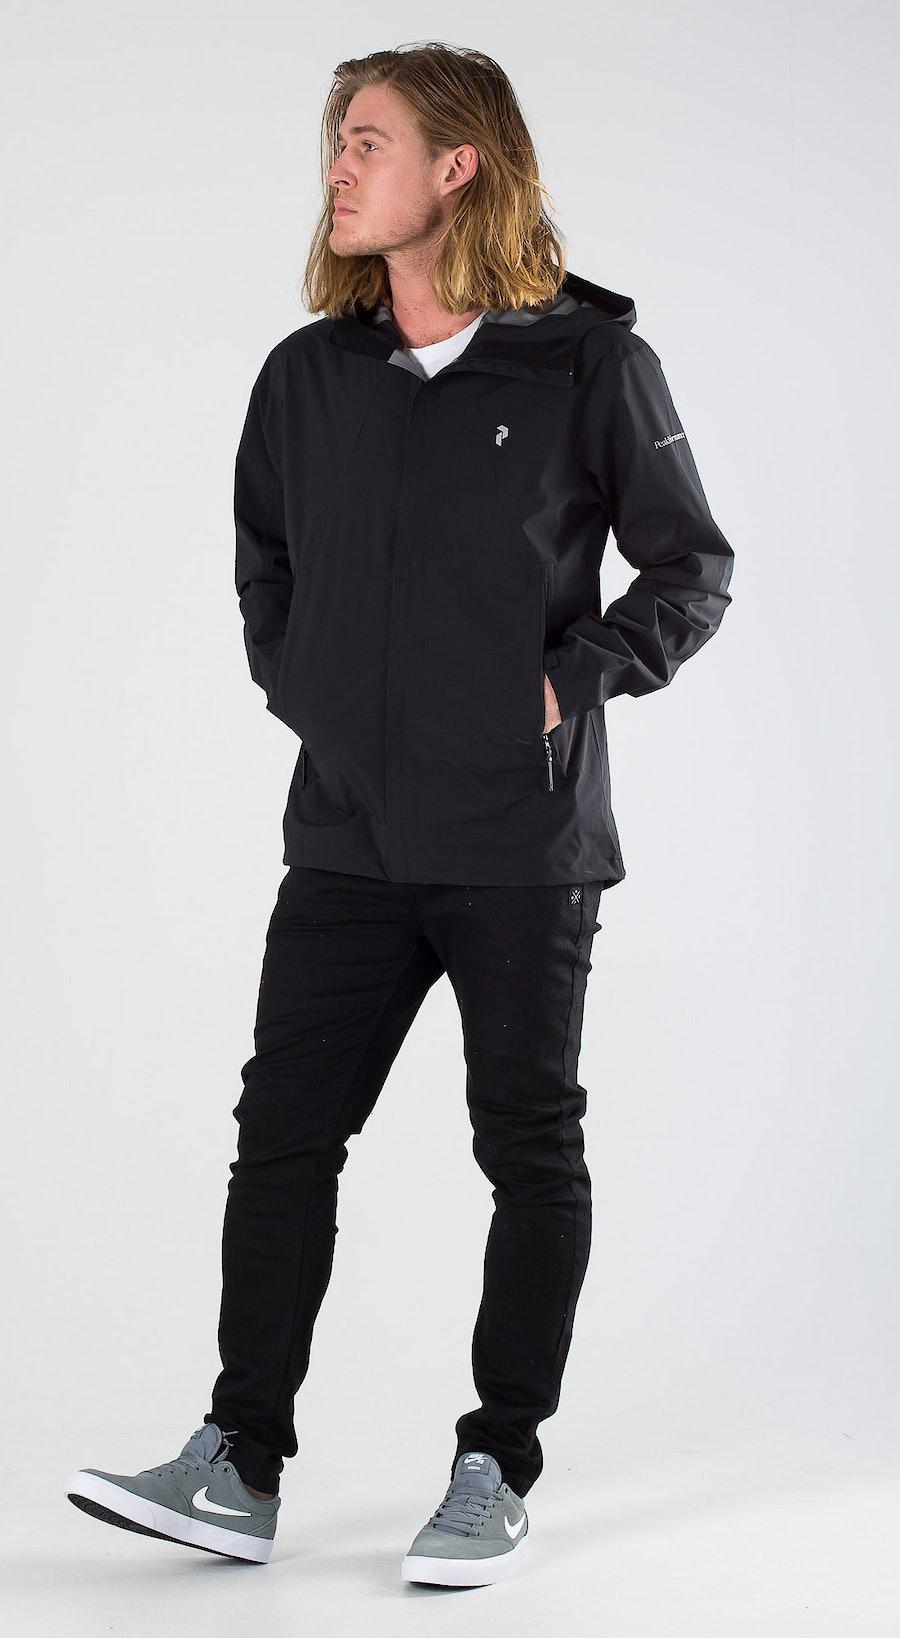 Peak Performance Daybreak Black Outfit Multi